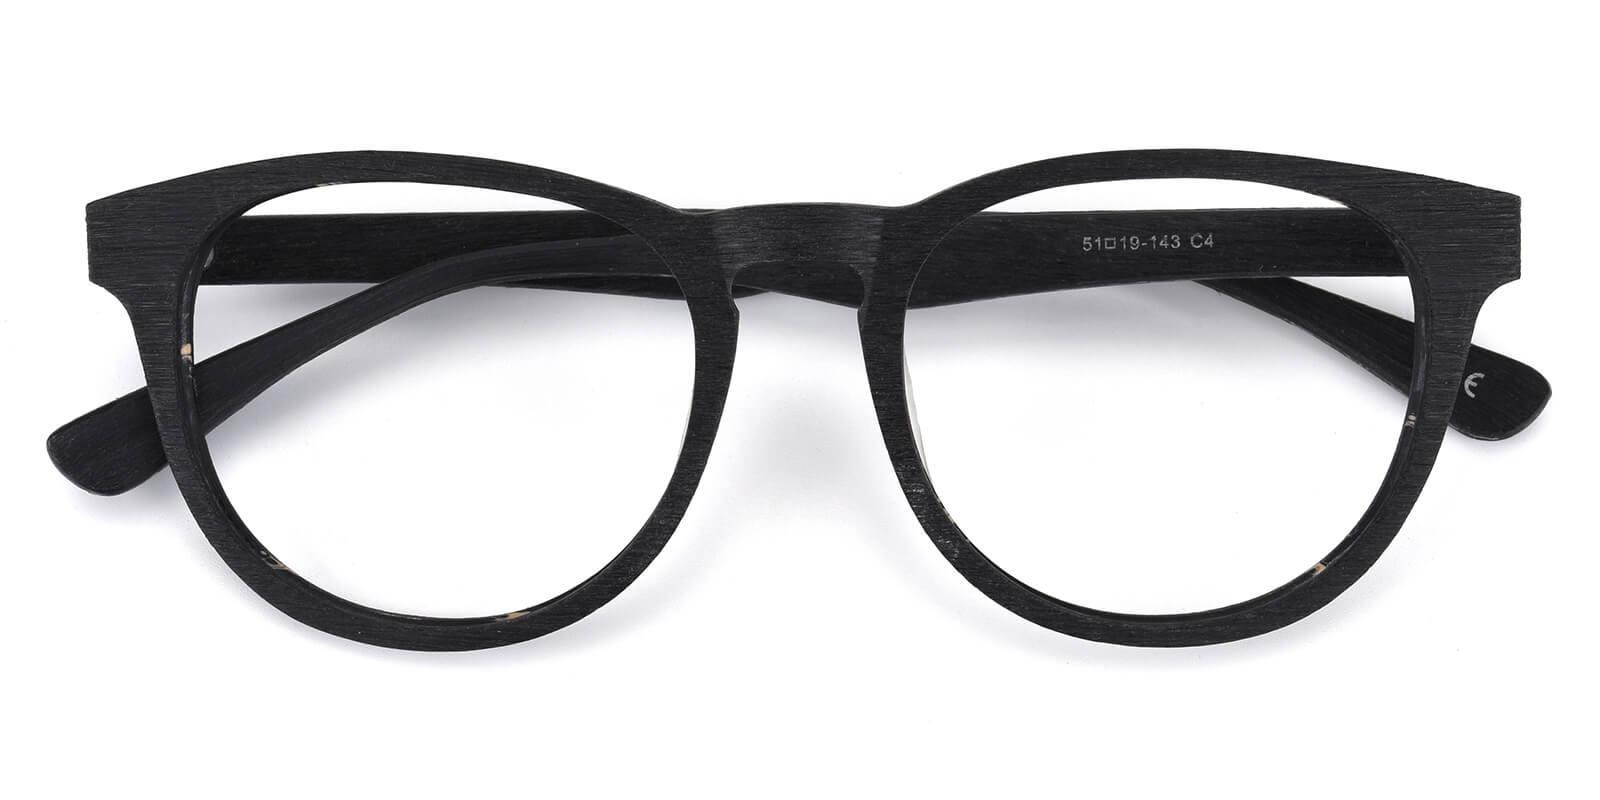 Rechela-Black-Round-Acetate-Eyeglasses-detail